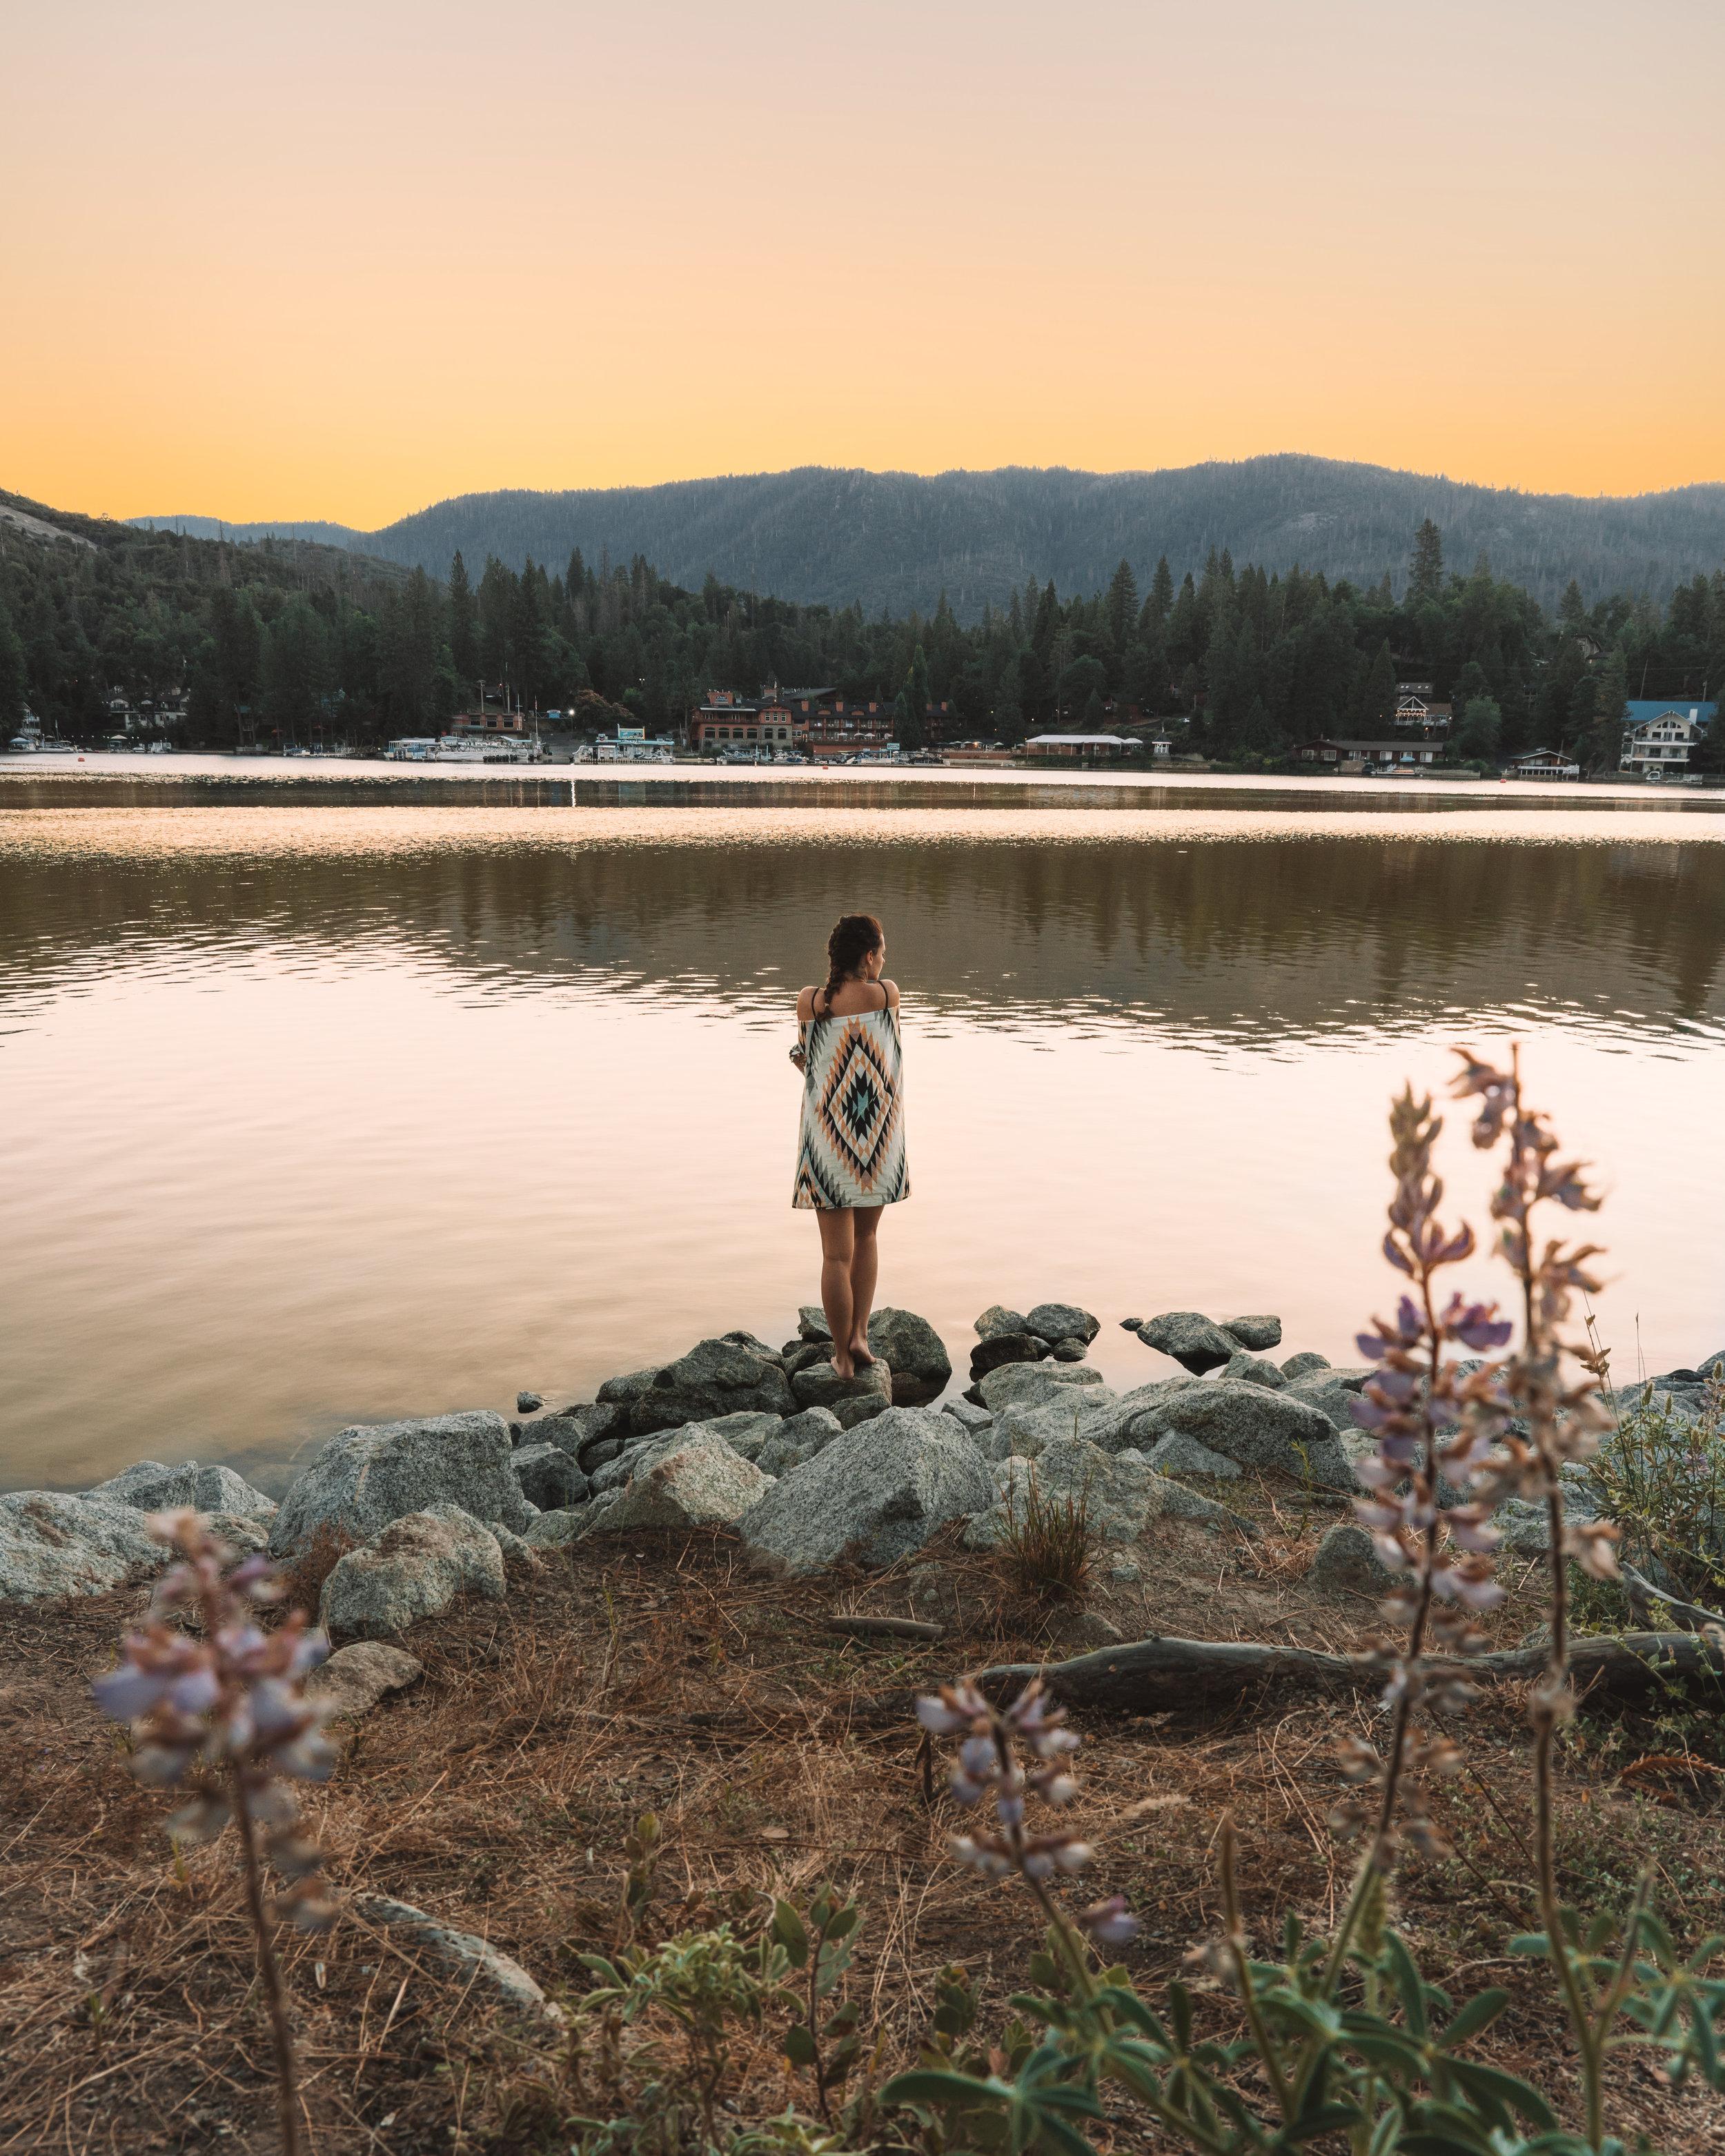 Sunrise on Bass Lake @zander.buteux